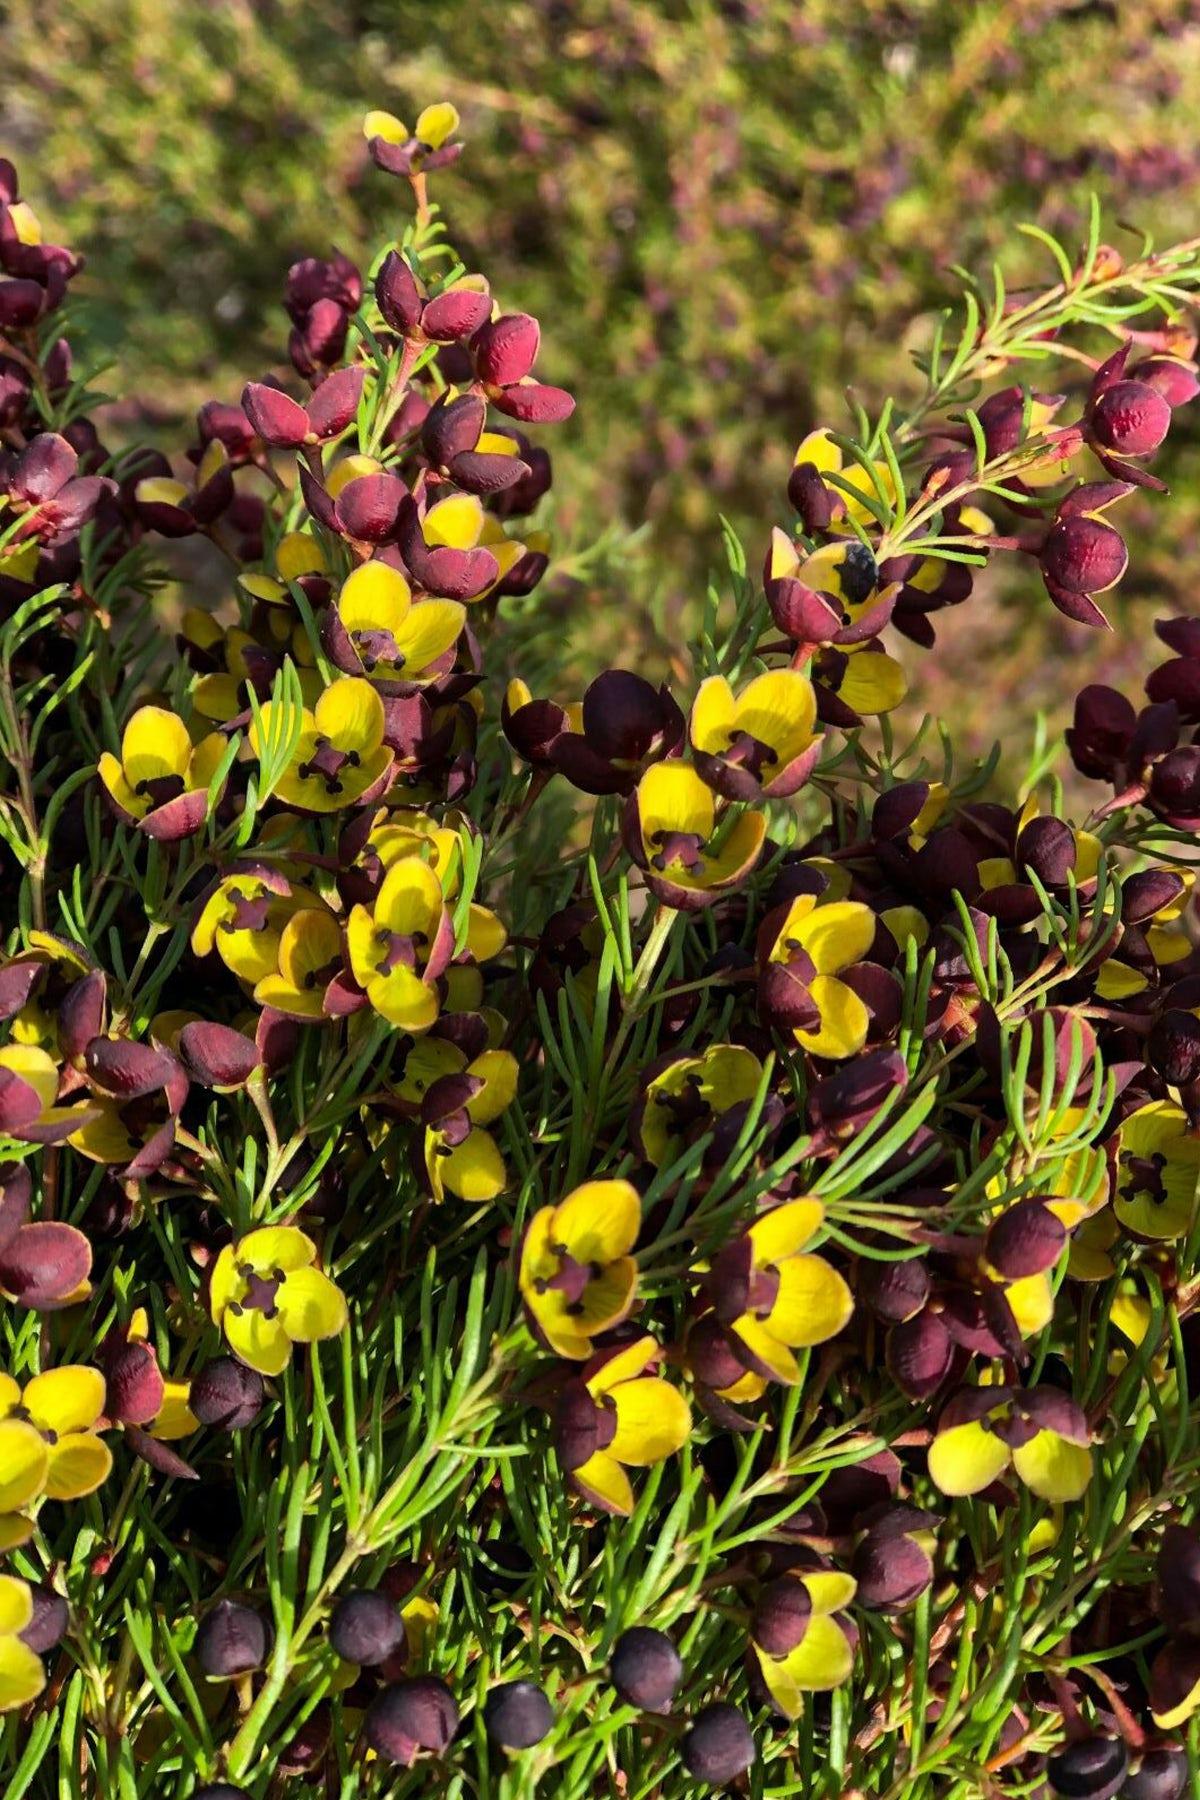 Essential Oils of Tasmania grows boronia megastigma flowers as one of its botanical ingredients. Essential Oils of Tasmania.